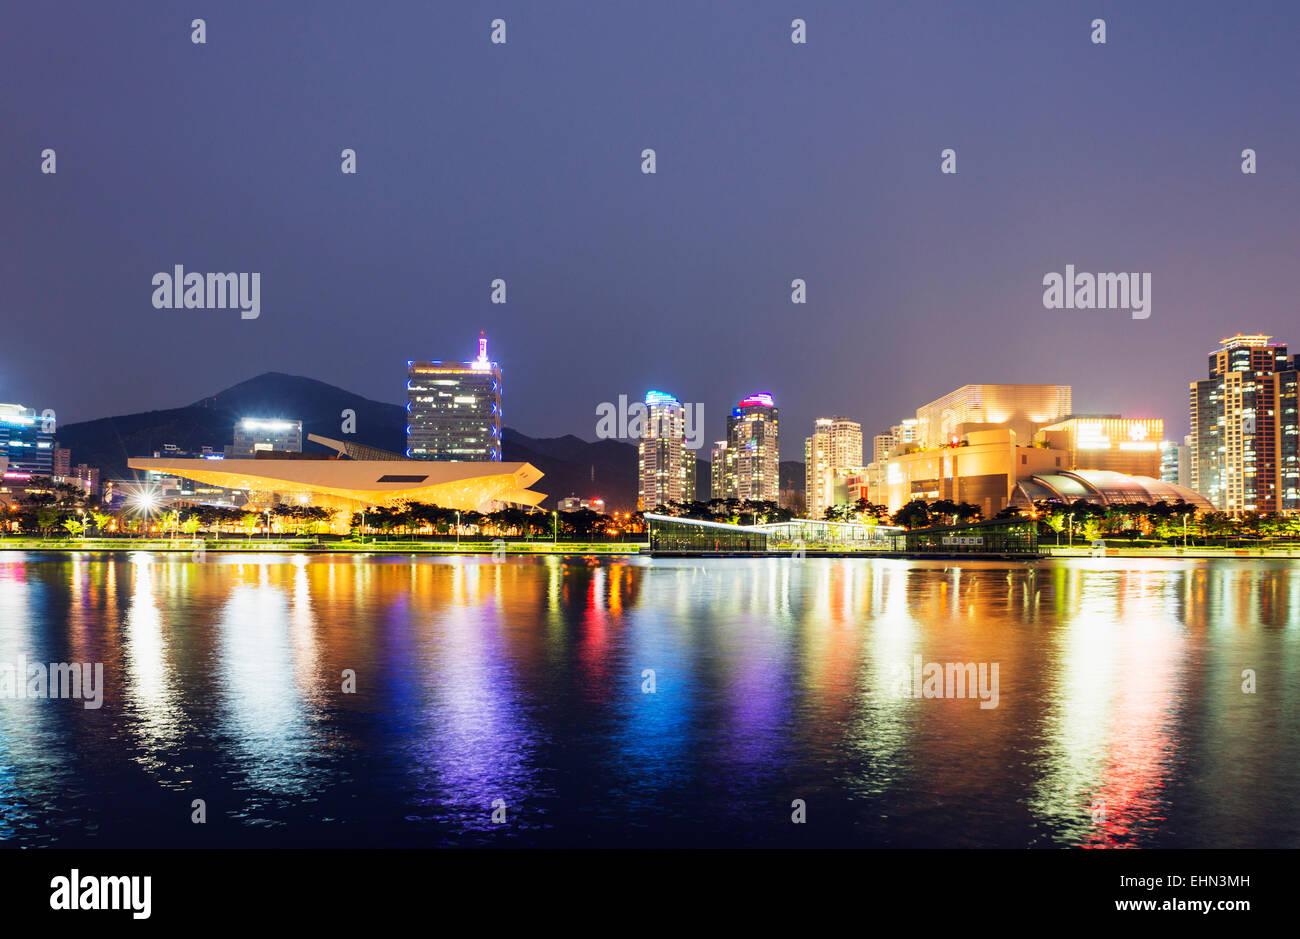 Asia, Republic of Korea, South Korea, Busan, Busan Cinema Center with cantilever roof - Stock Image